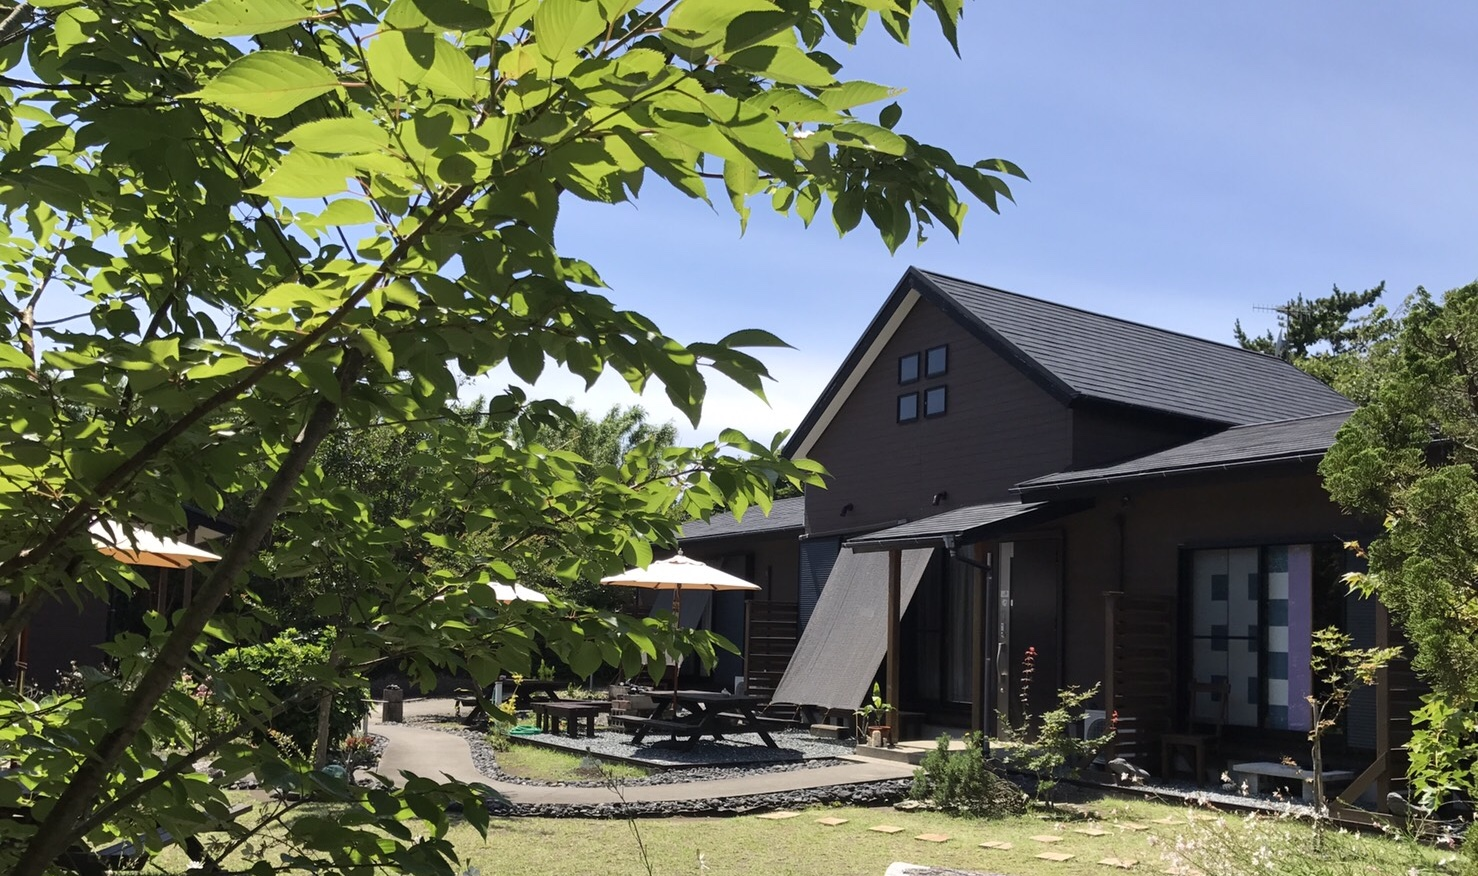 Hale海 Guest House Oshima◆楽天トラベル